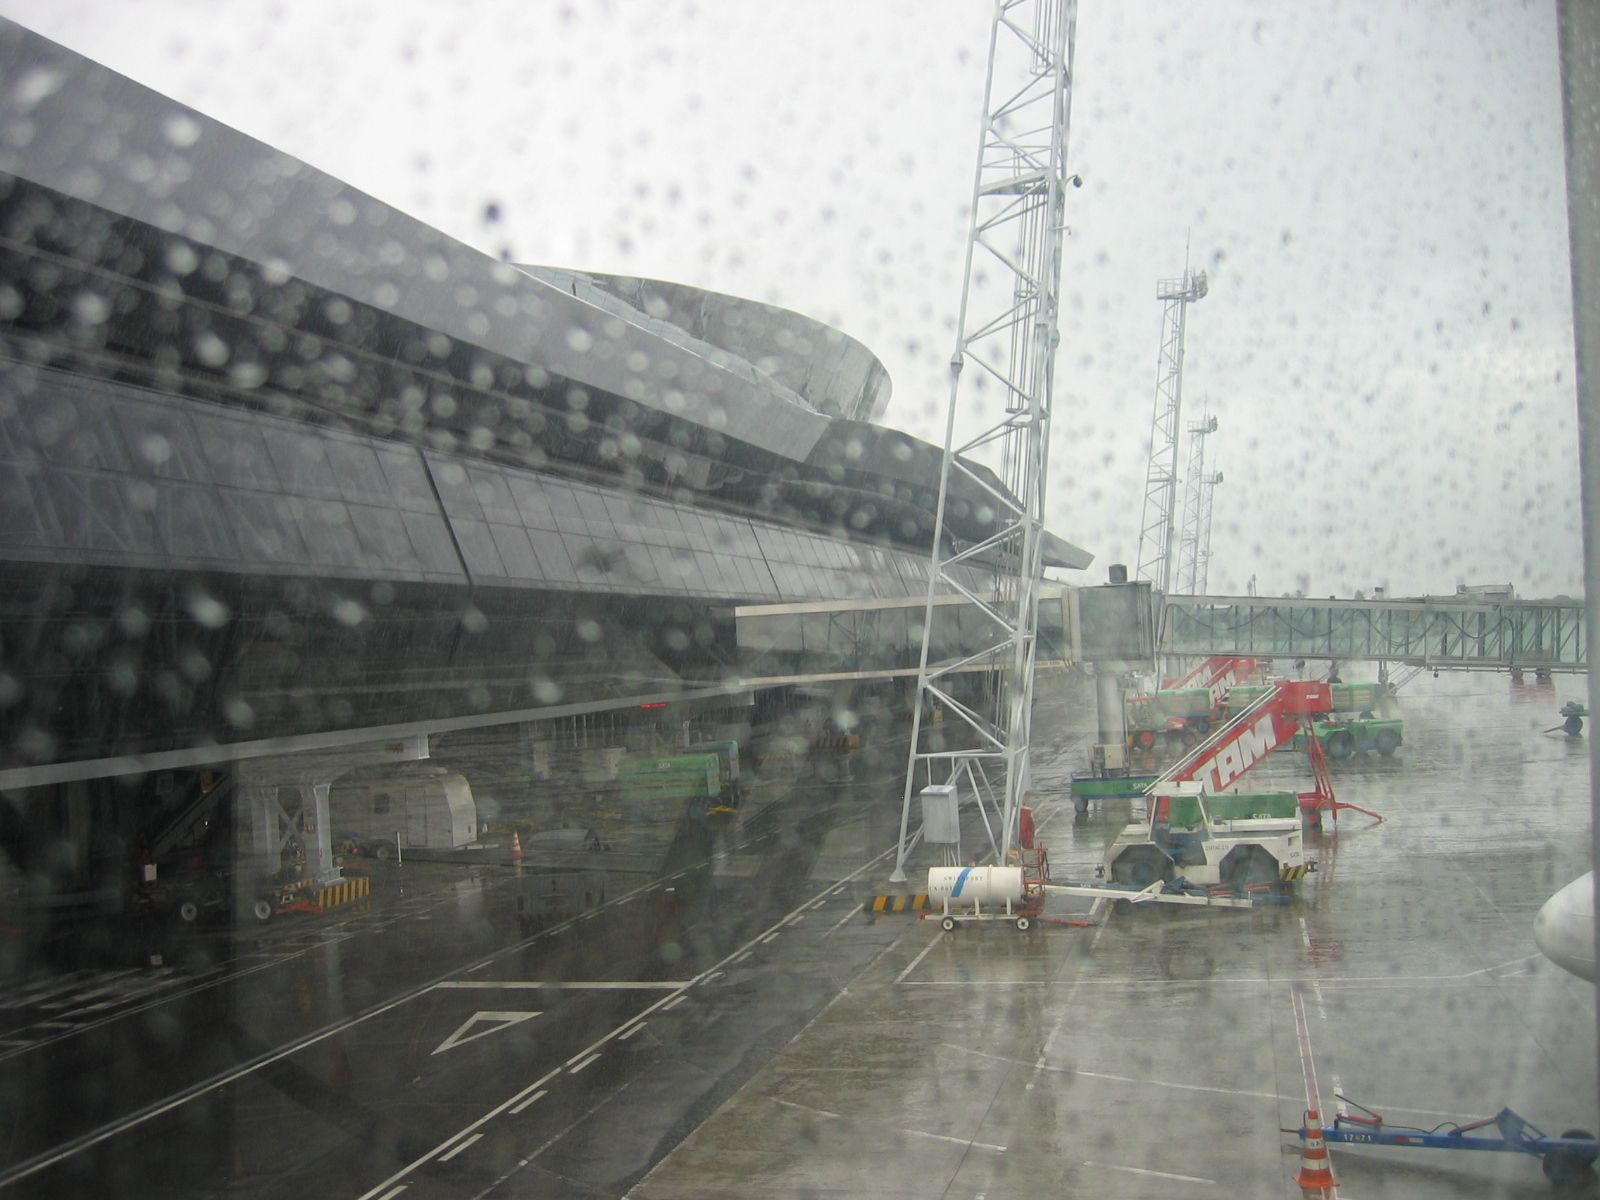 """Aeroporto Internacional dos Guararapes"". # Recife, Pernambuco. Brasil."